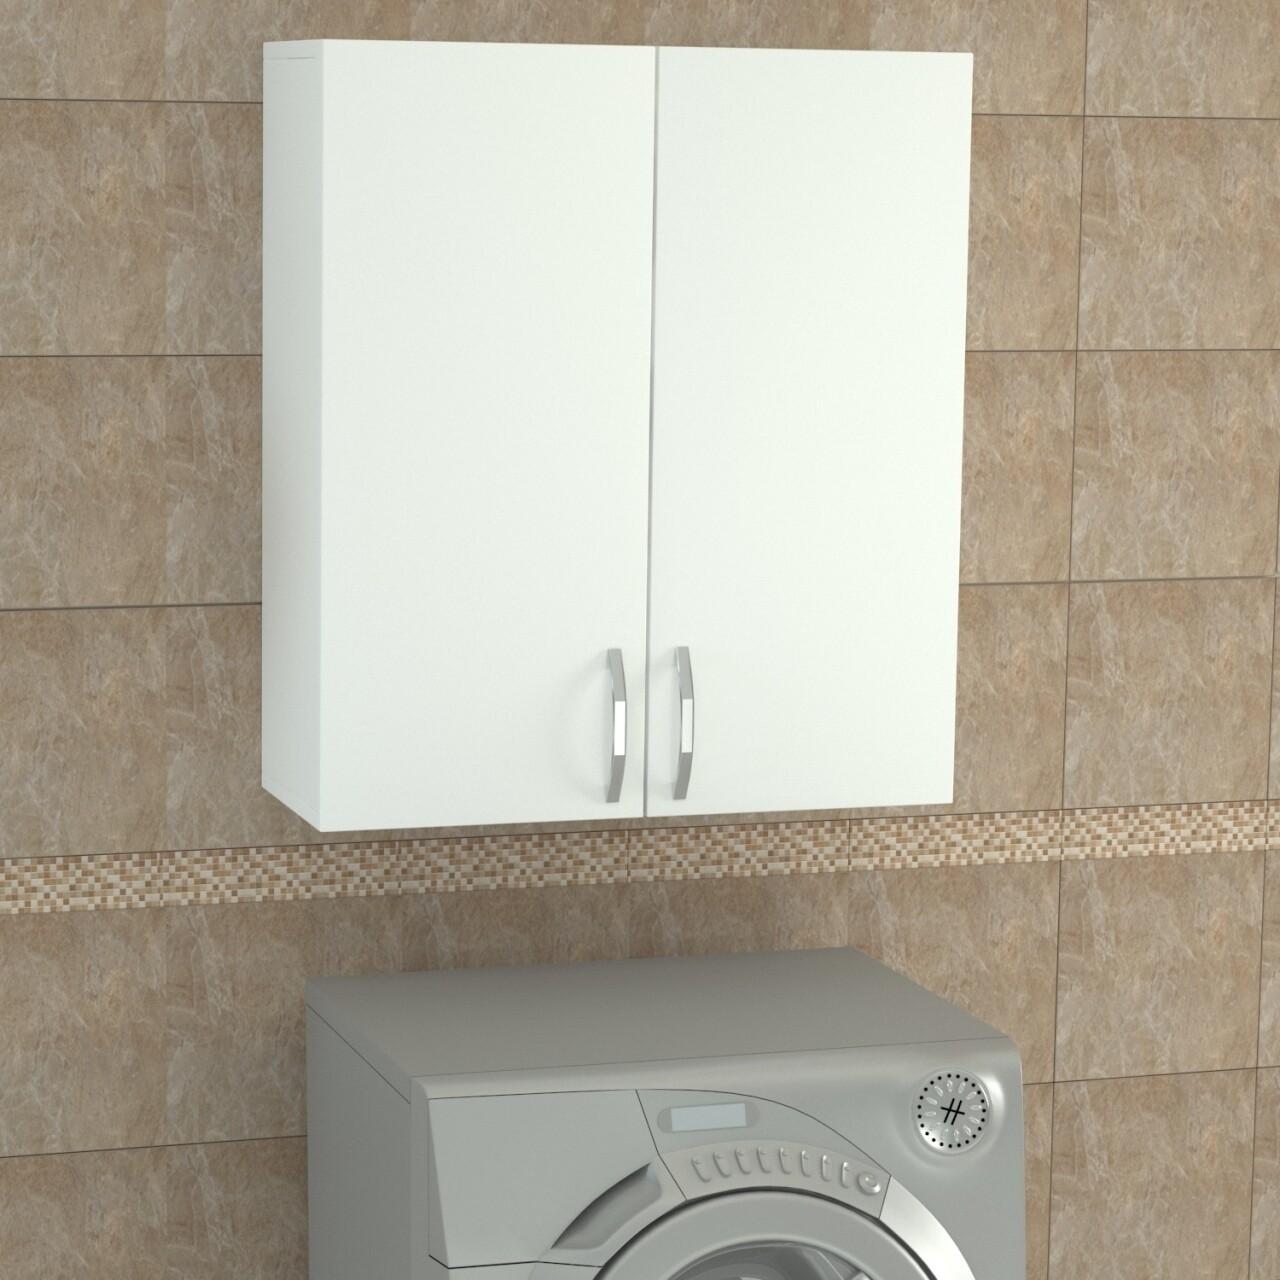 Dulap pentru baie, Wooden Art, Benito Ust White, 70x80x27.1 cm